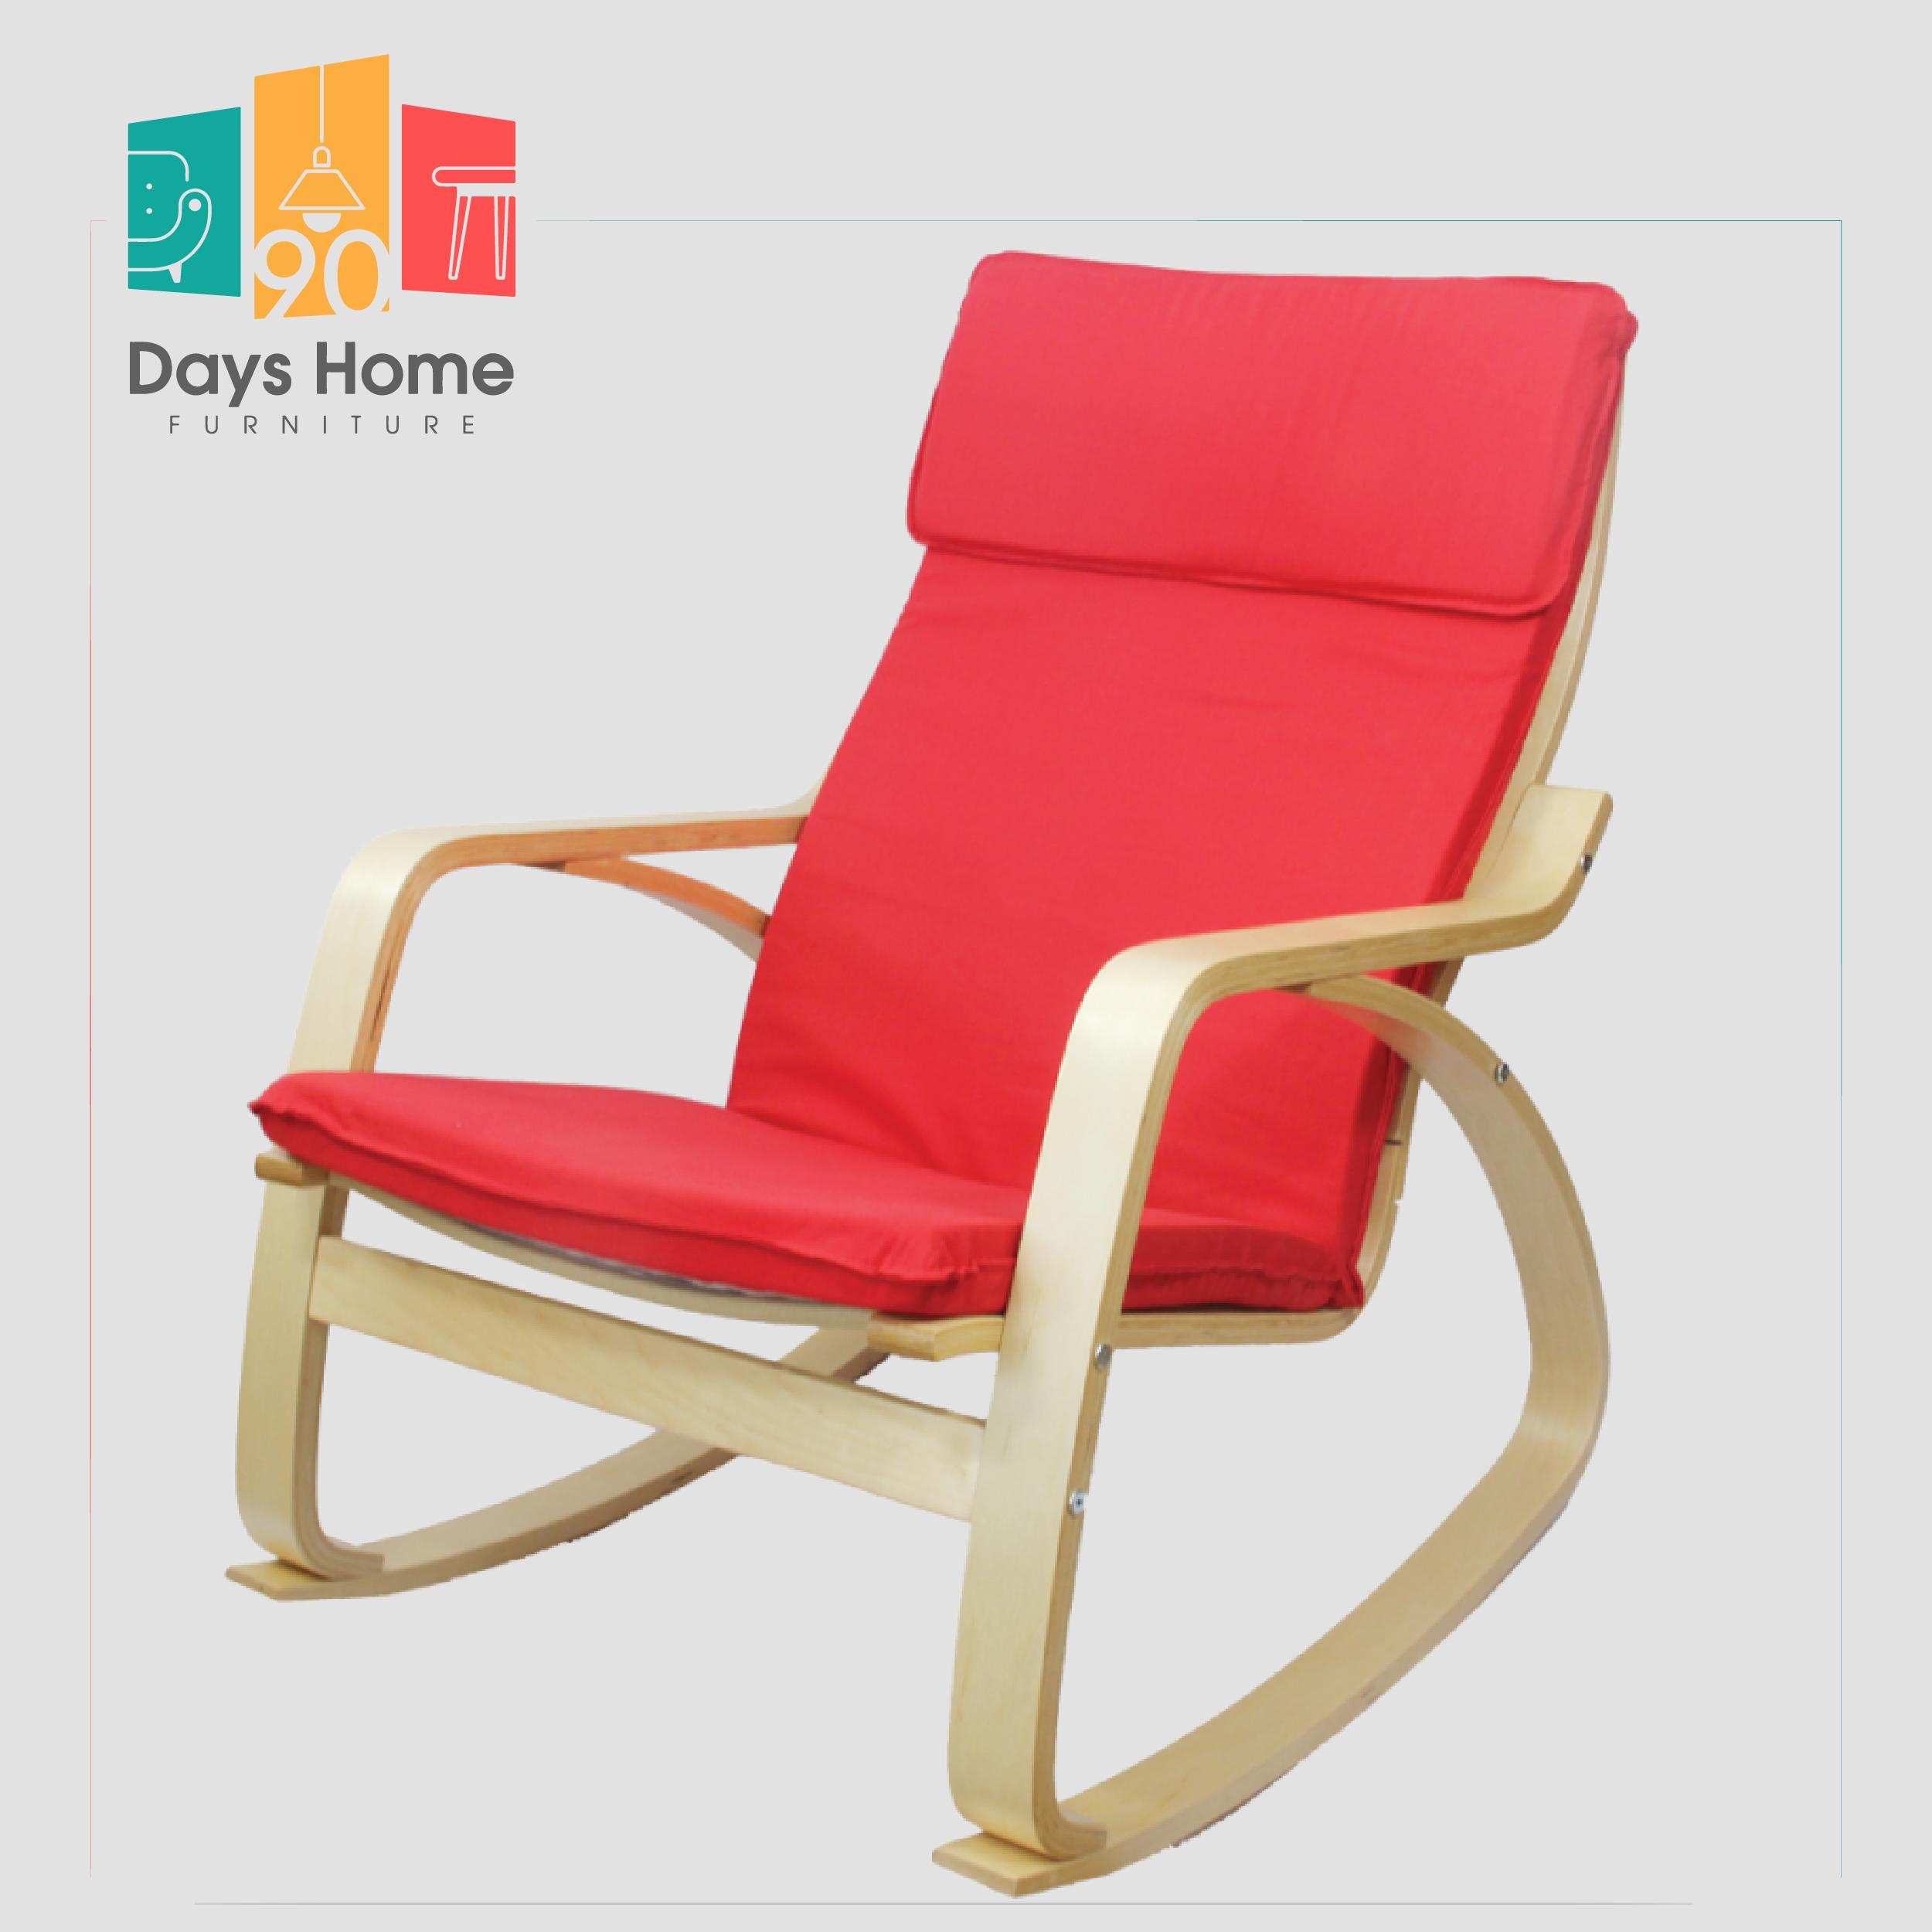 كرسي استرخاء خشبي هزاز